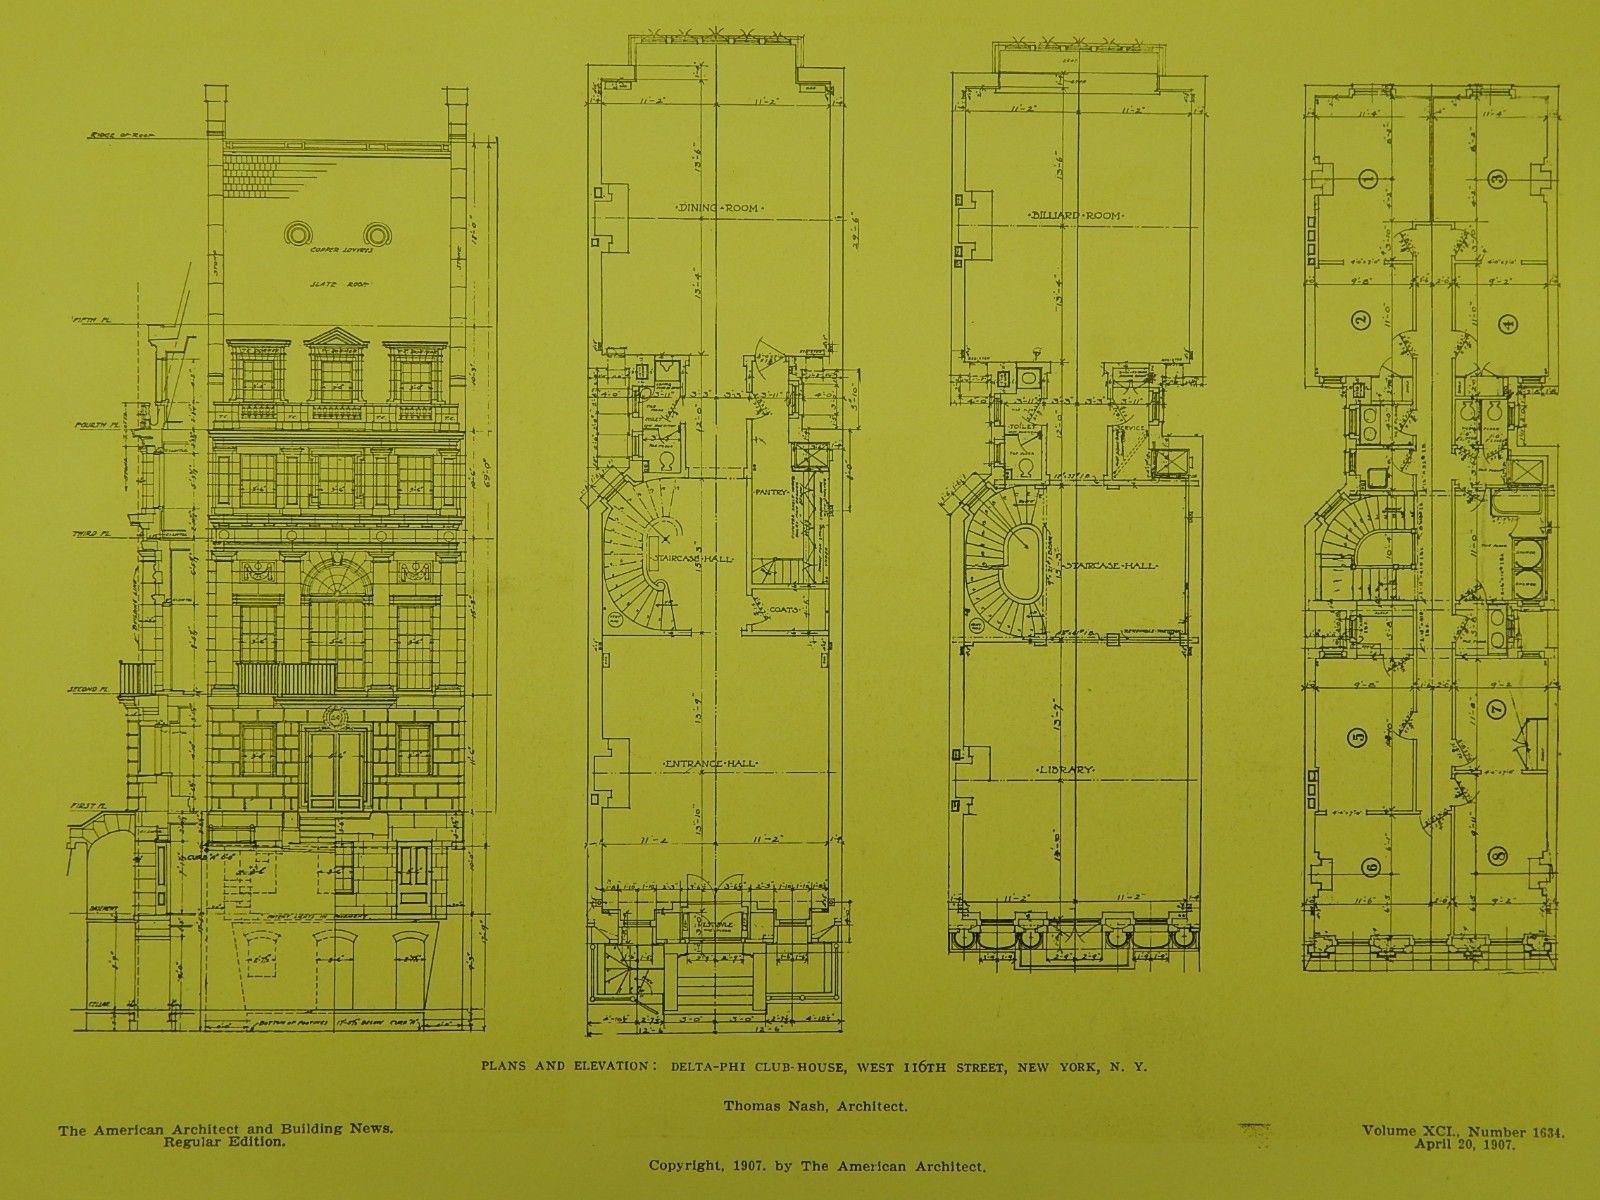 Elevation of the Delta-Phi Club-House in New York NY, 1907. Thomas Nash